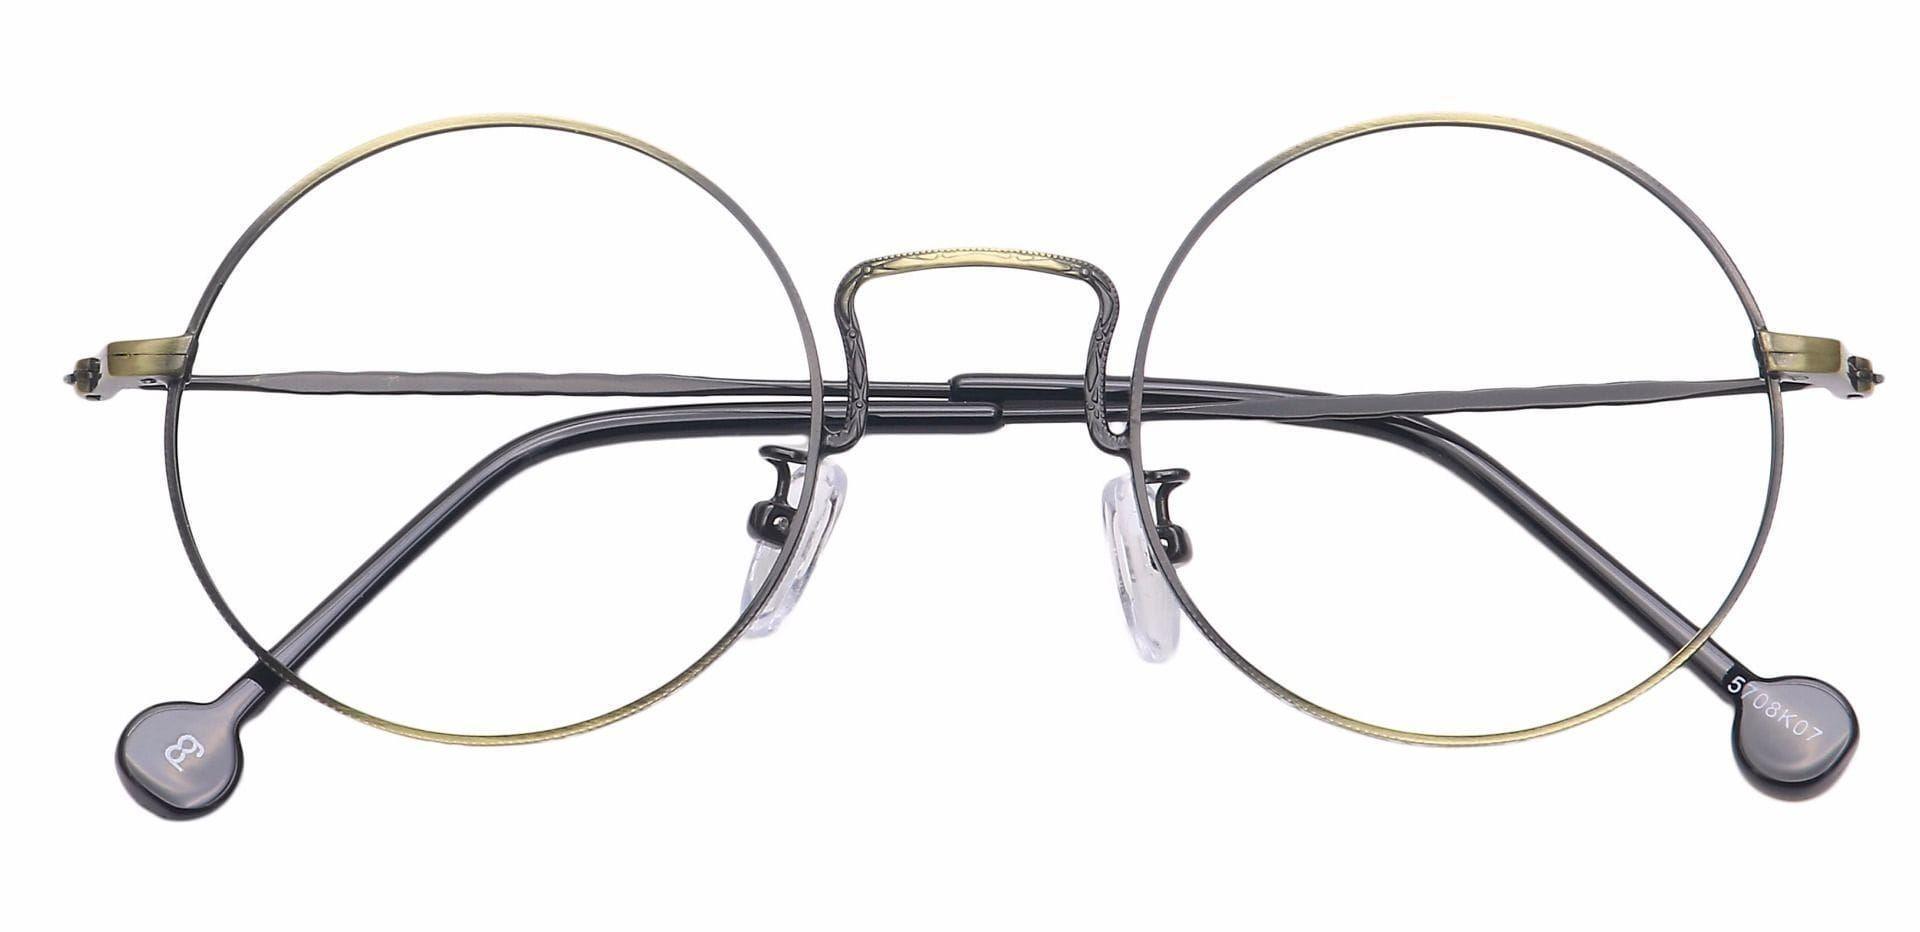 Razz Circular Reading Glasses - Black